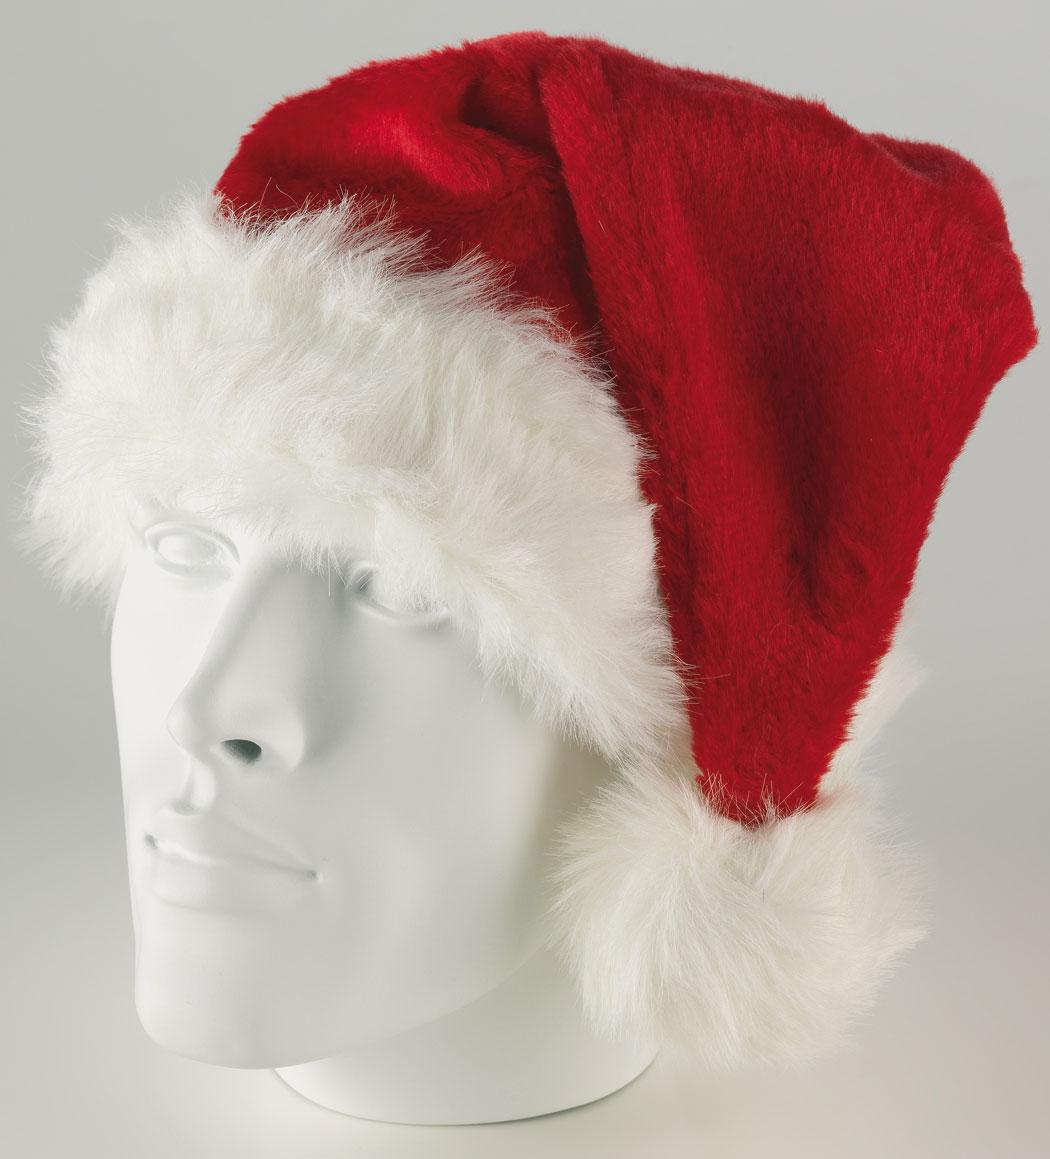 Kaemingk Nikolausmütze / Weihnachtsmann Mütze Bild 1